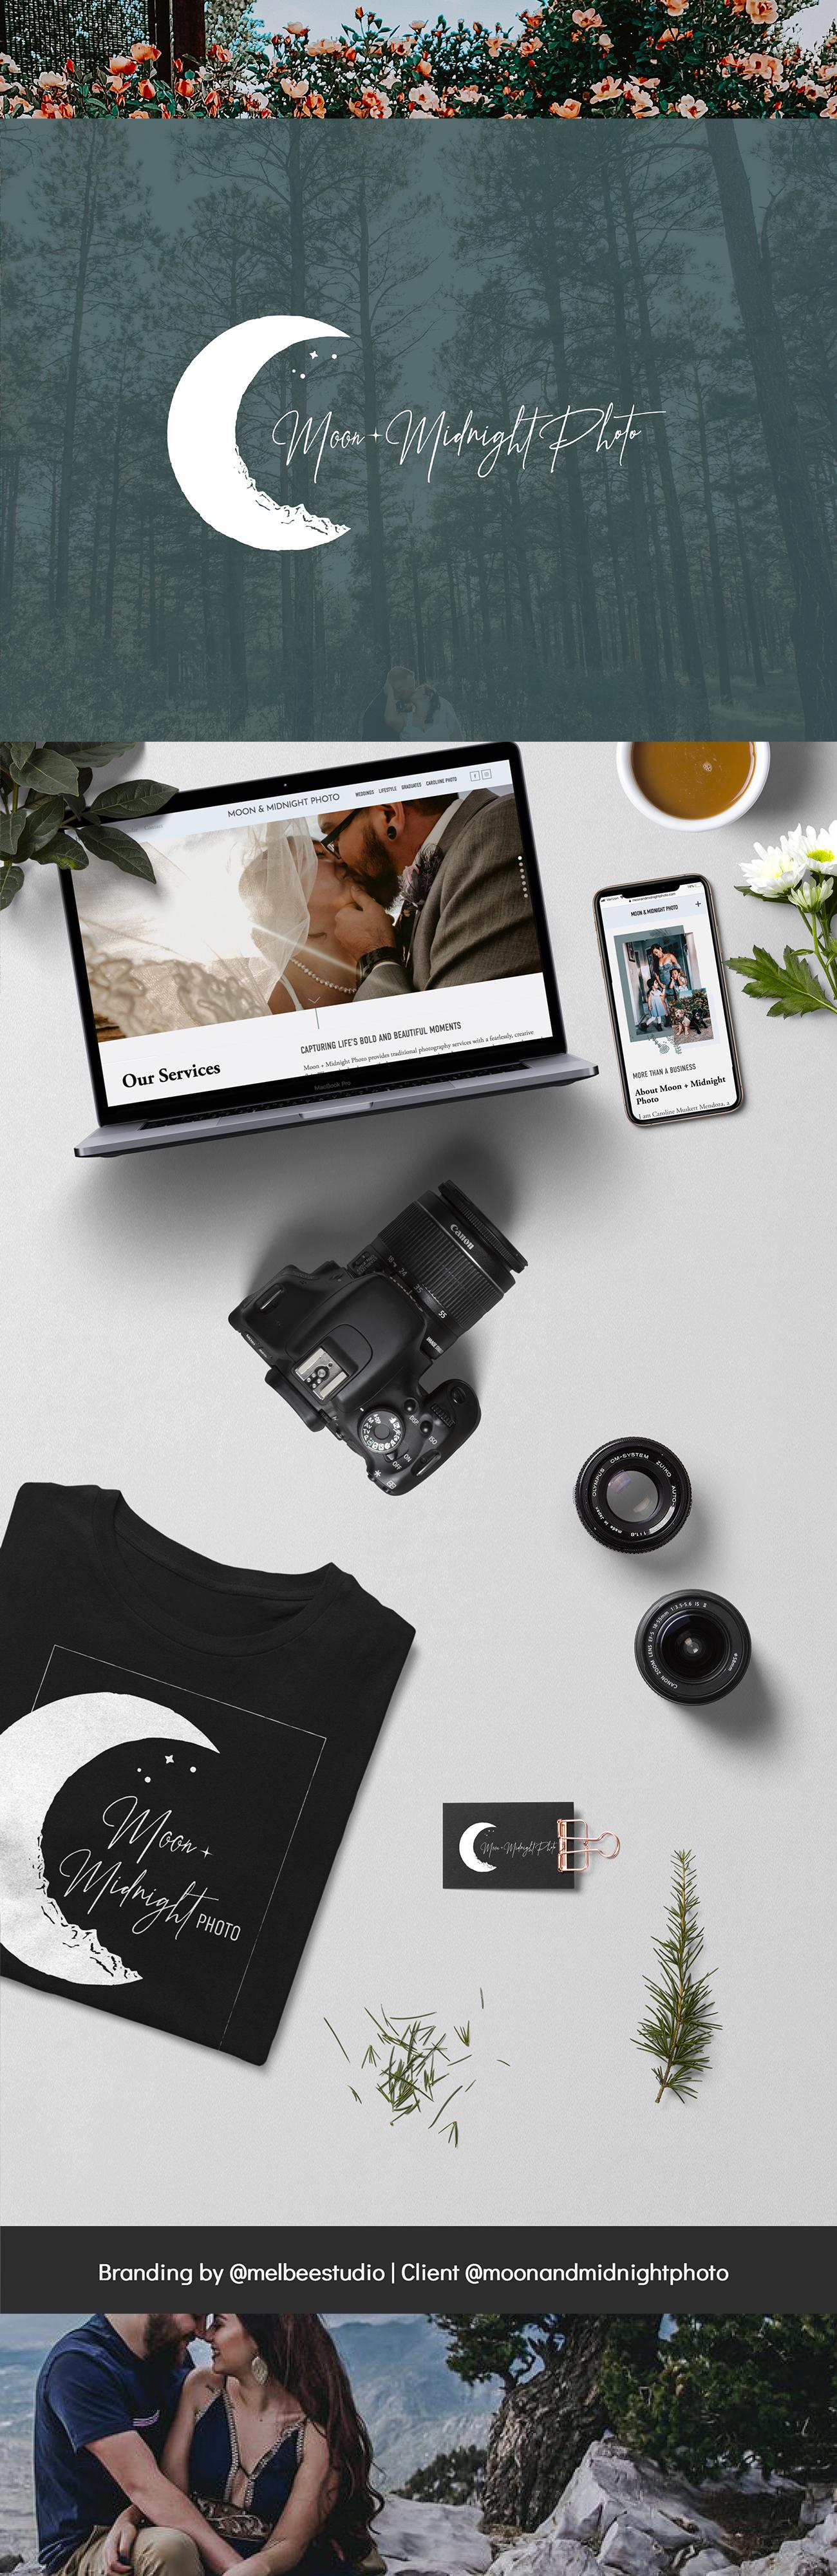 Photography brand design, photography branding, photography web design, photography logo design